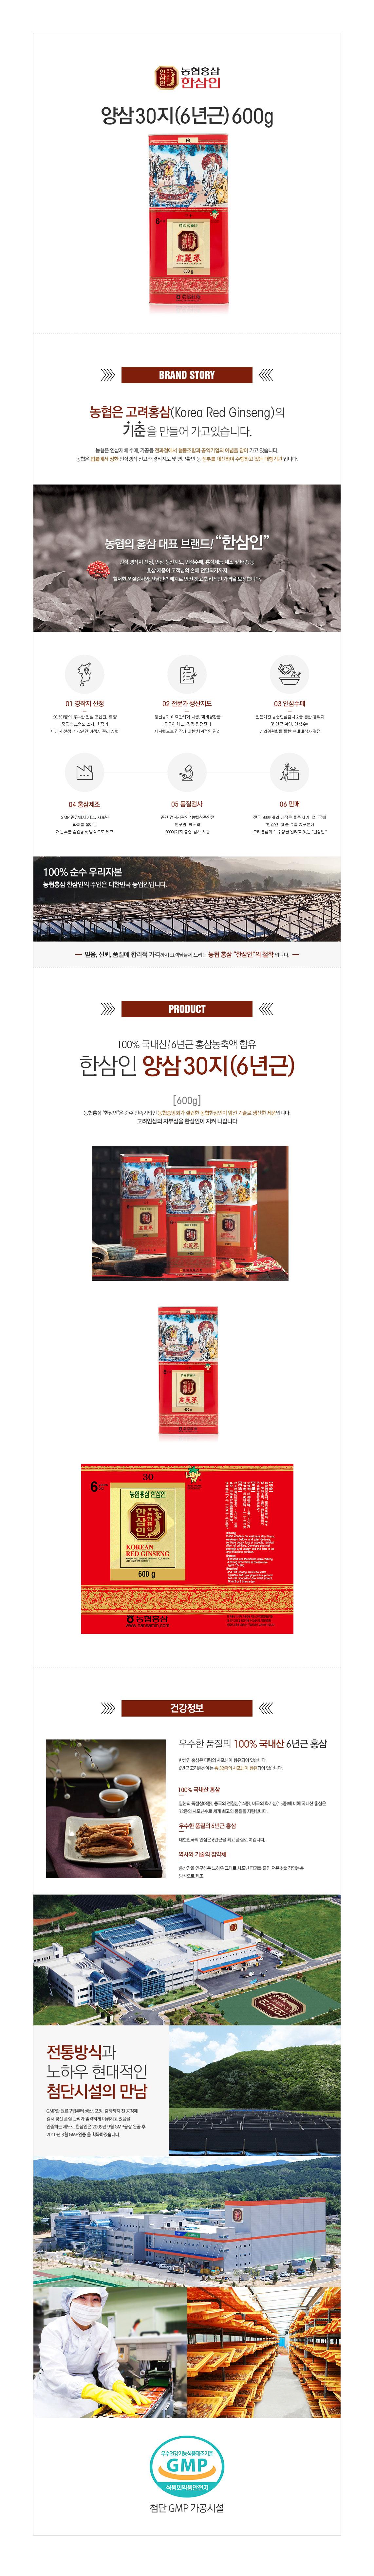 Korean Red Ginseng 19 Roots 10.58oz(300g)